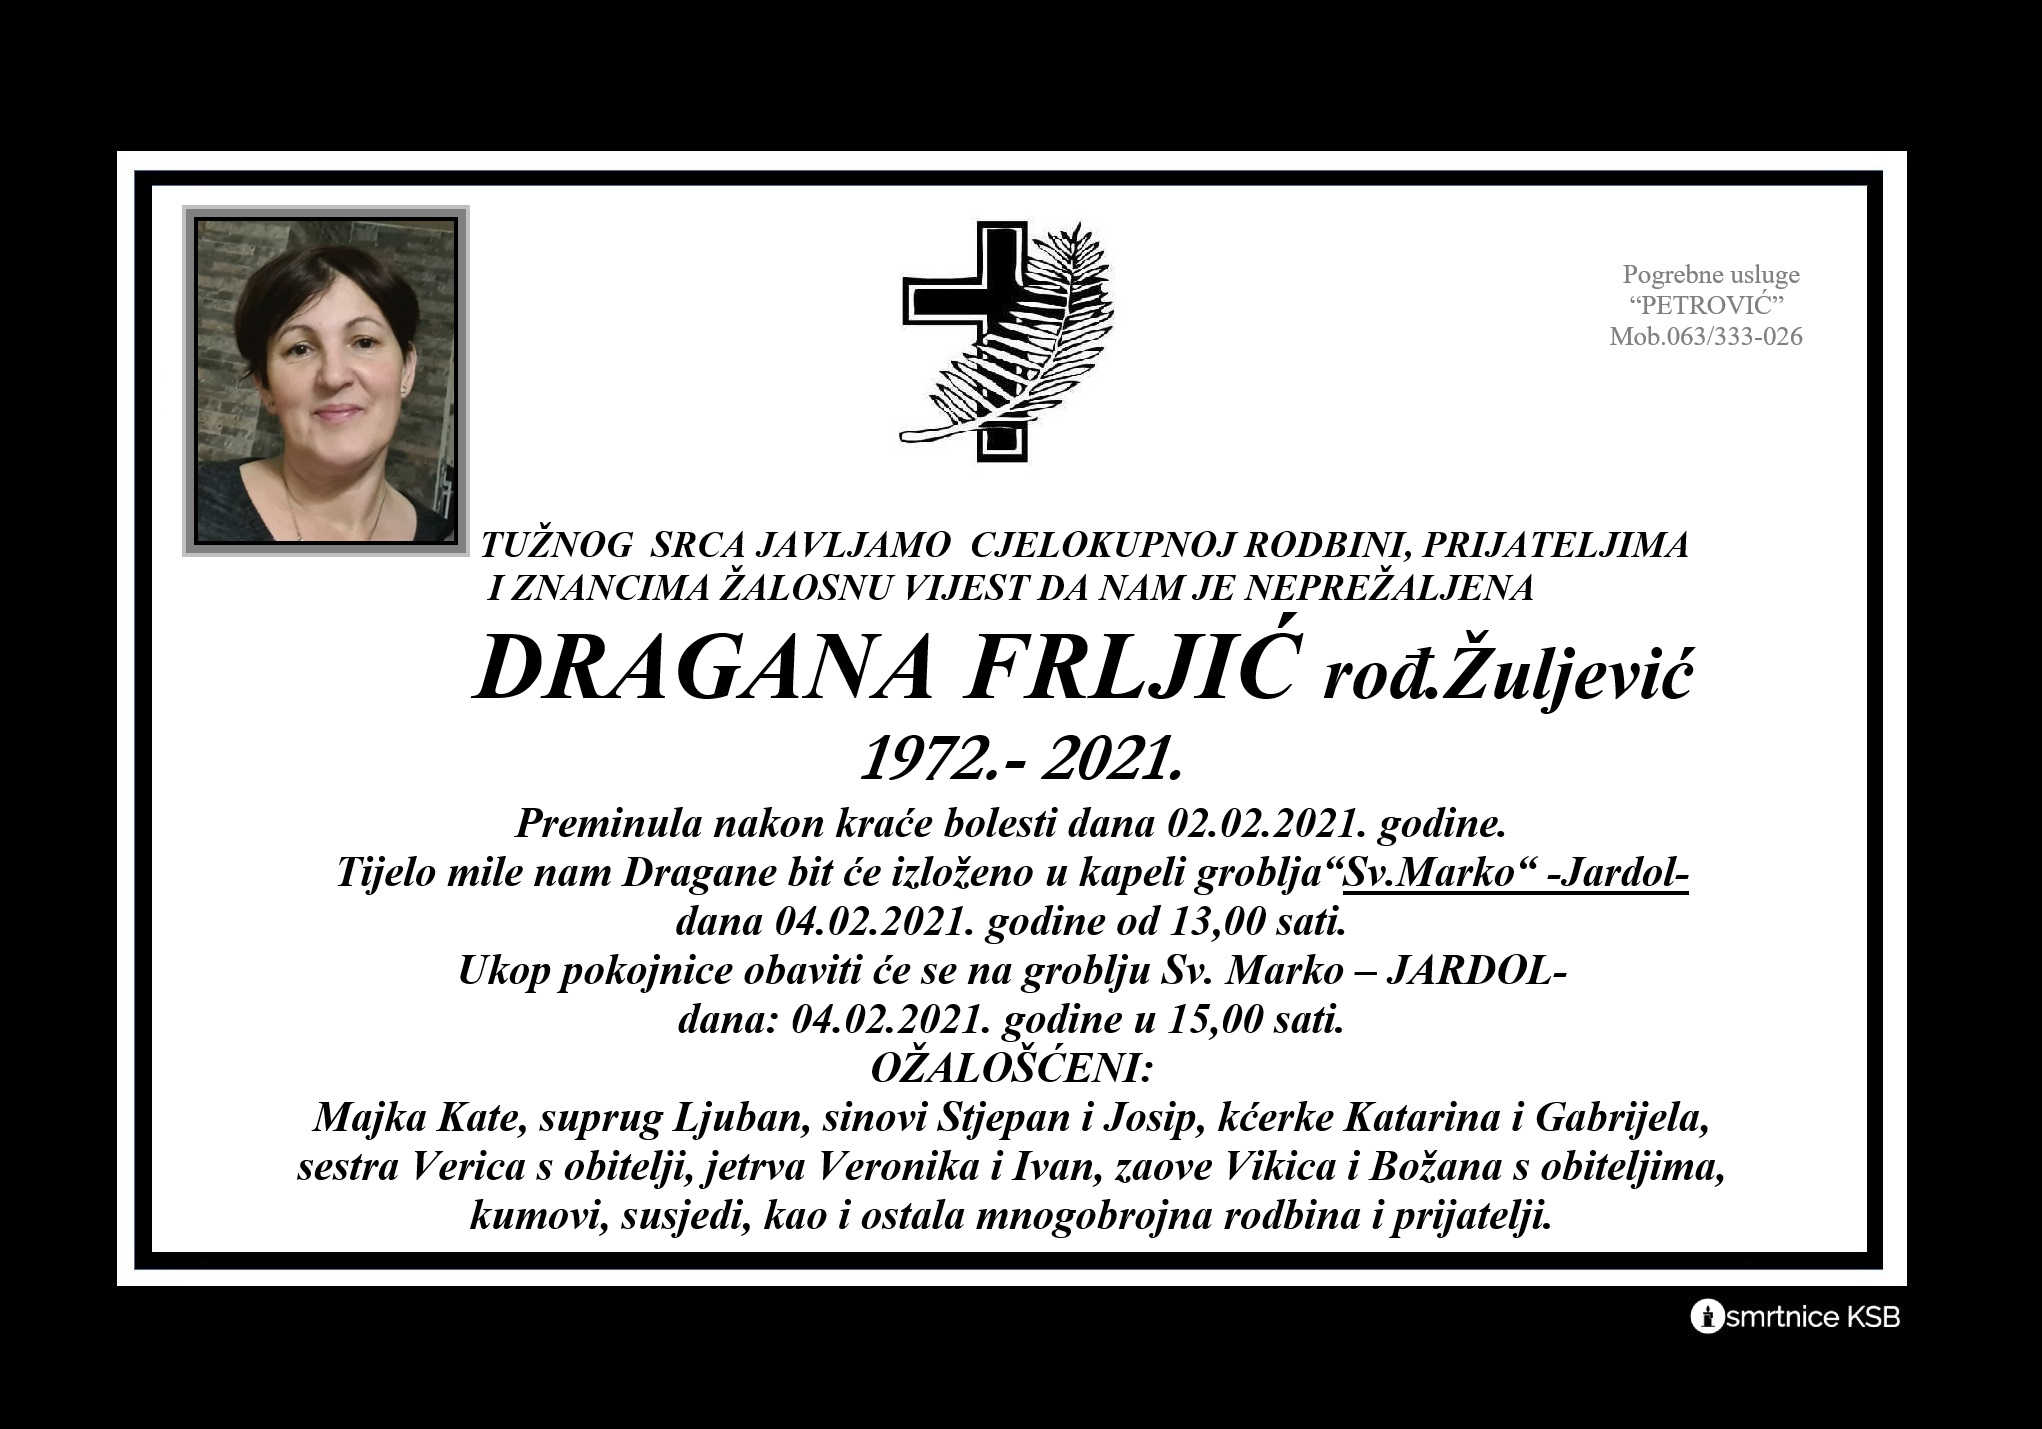 Dragana Frljić rođ. Žuljević